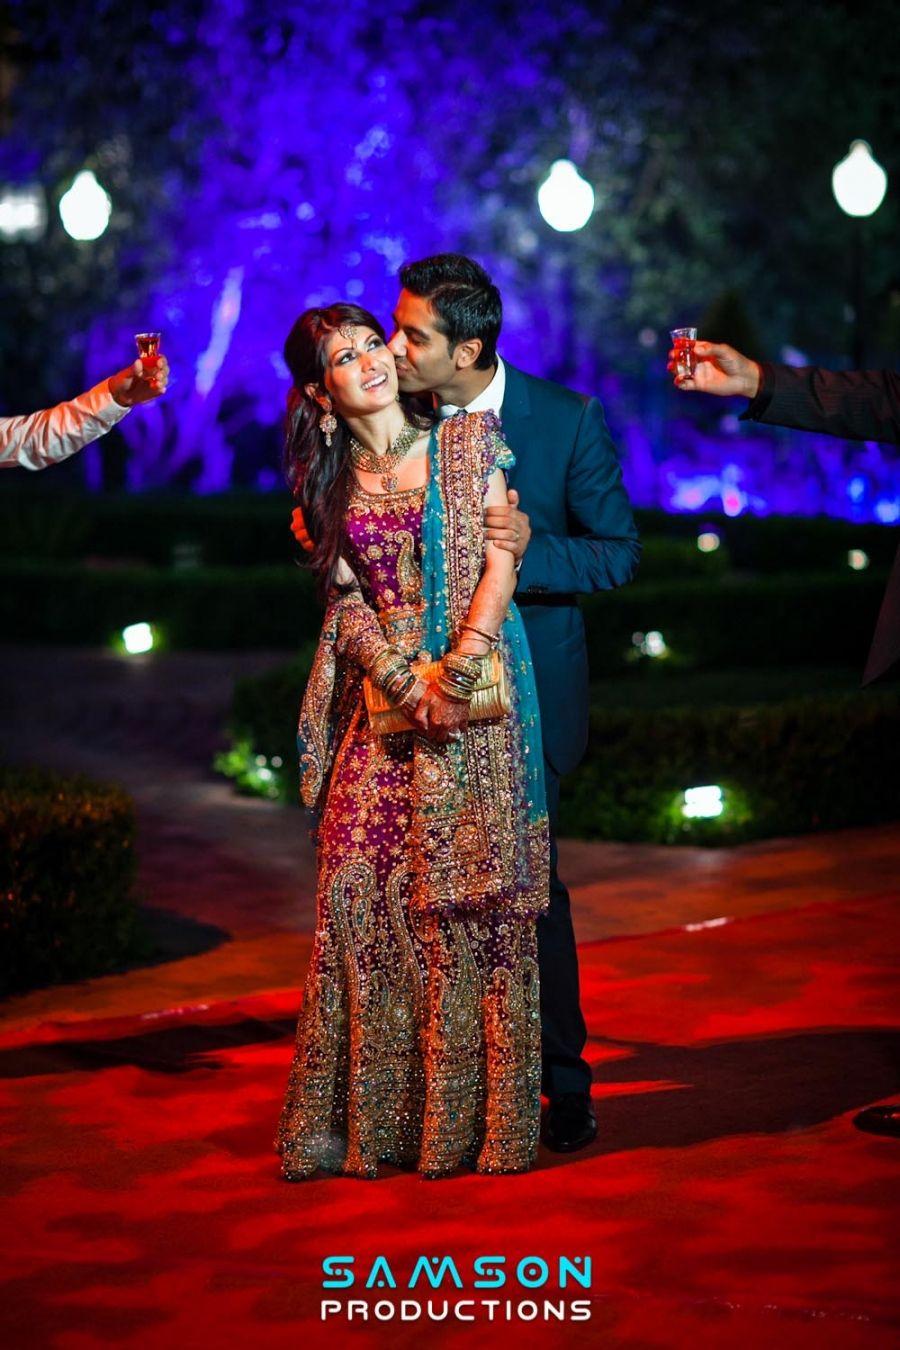 South asian wedding dresses  nice lengha  South Asian weddings   Pinterest  Wedding South